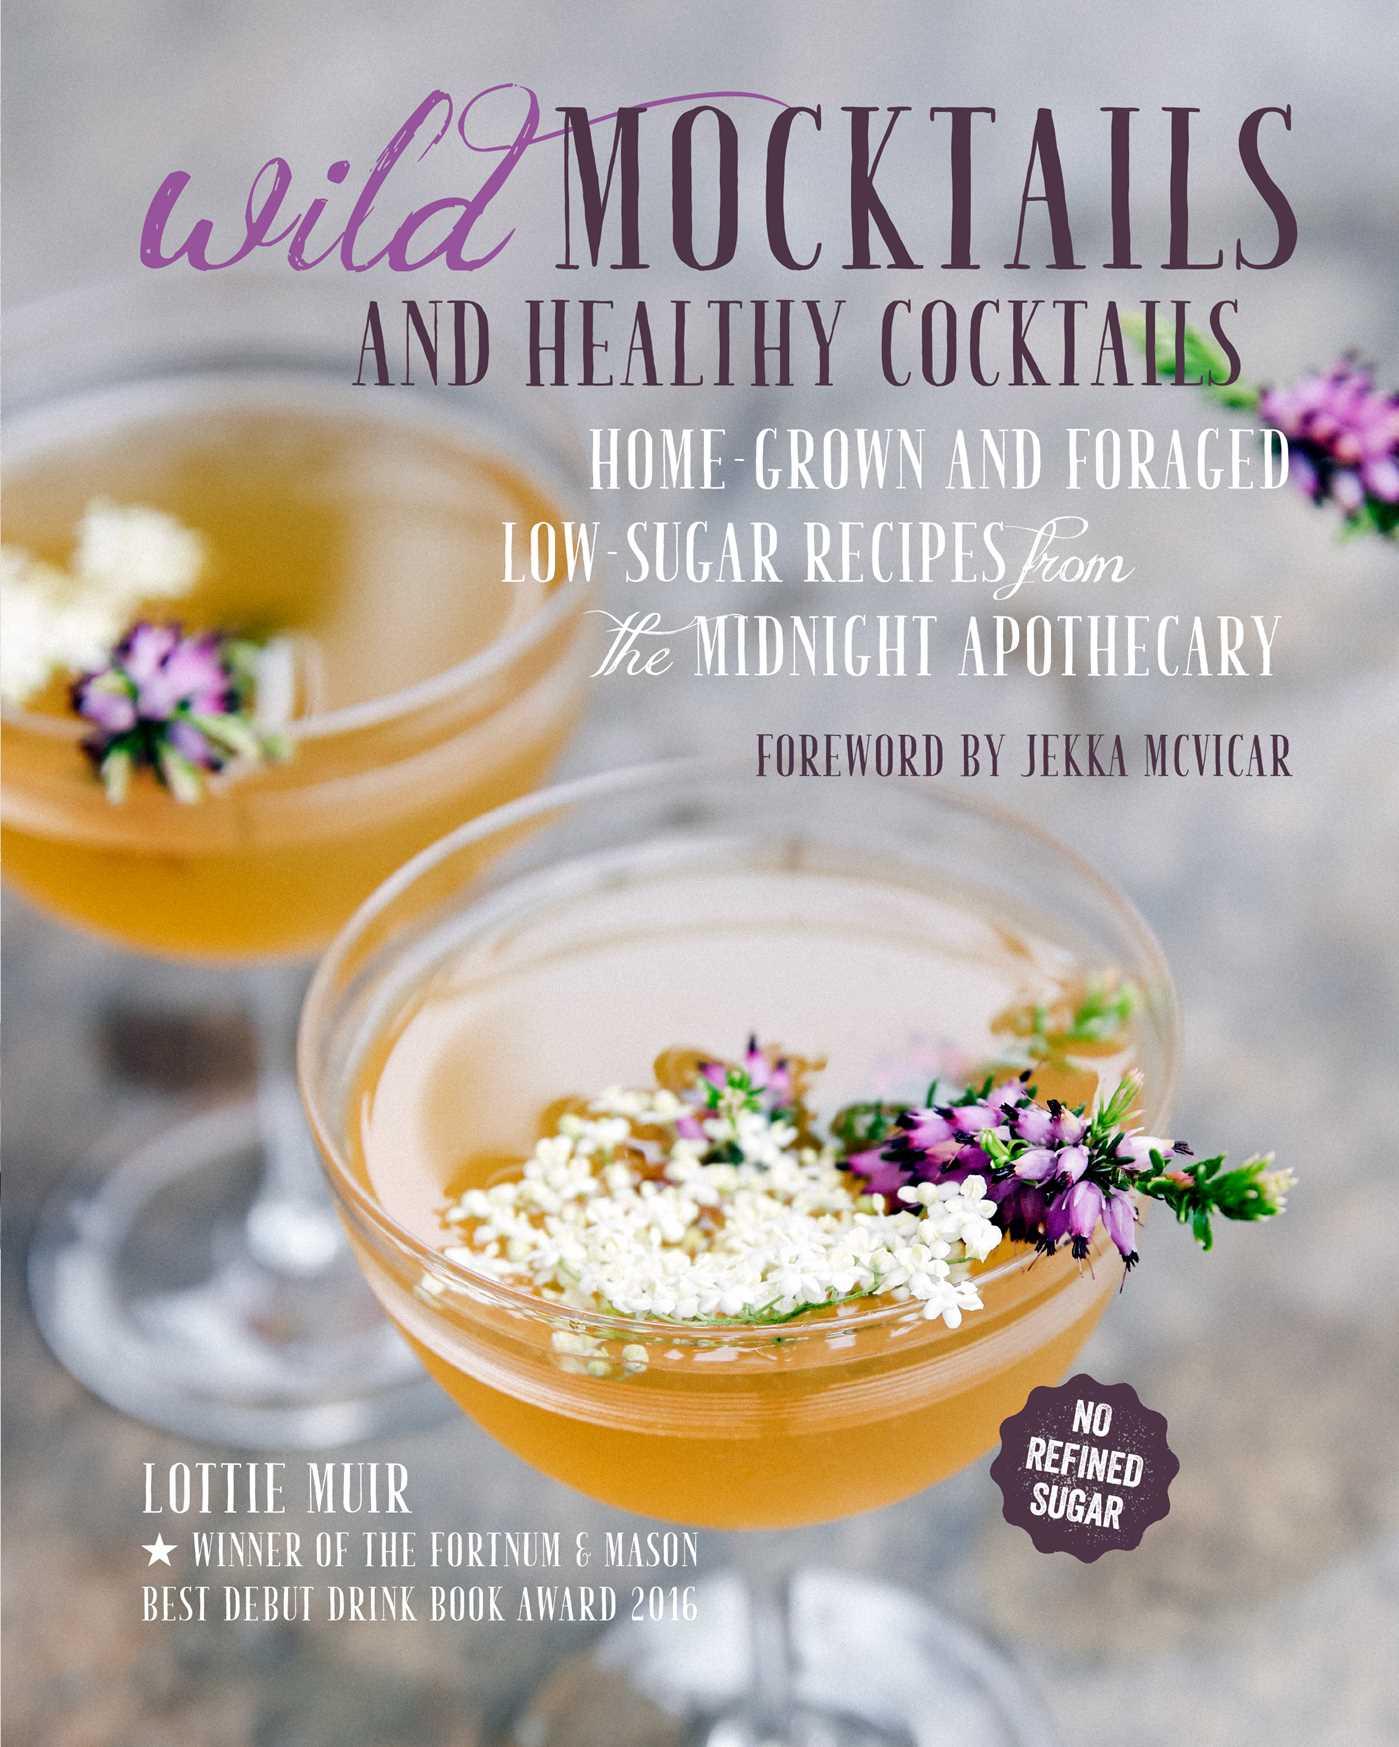 Wild mocktails and healthy cocktails 9781782494430 hr